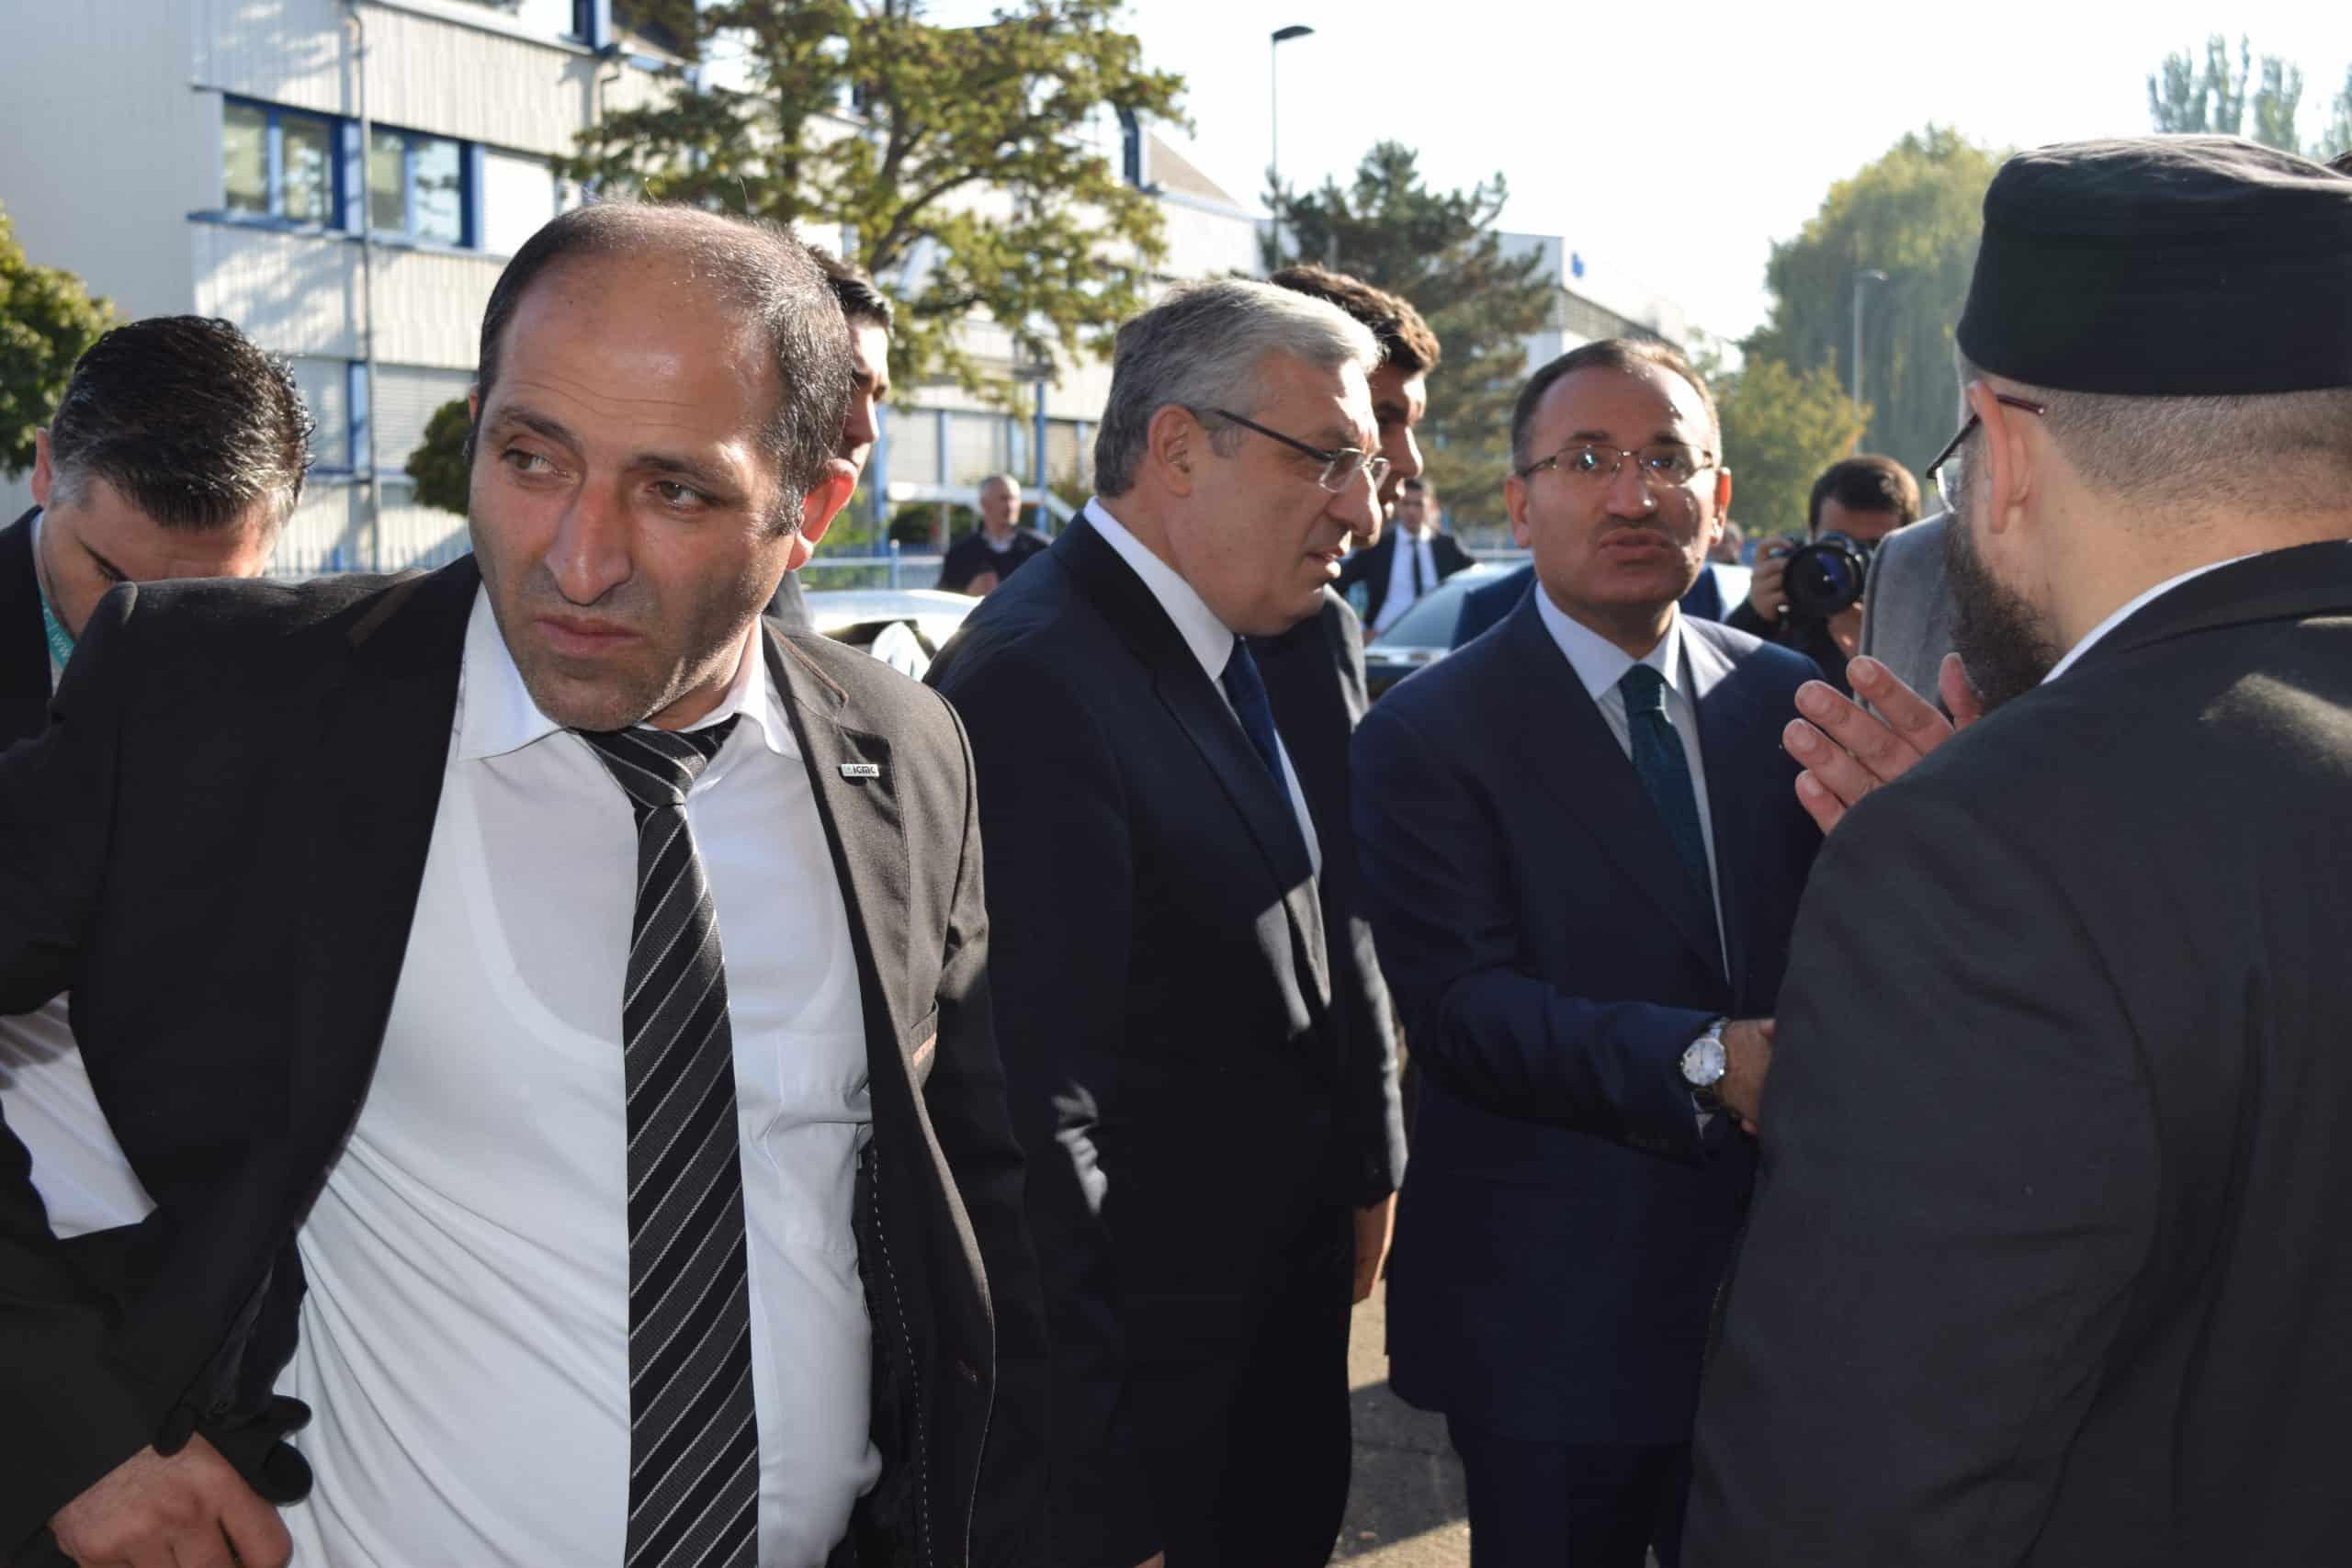 Bekir Bozdag, vice-premier ministre turc